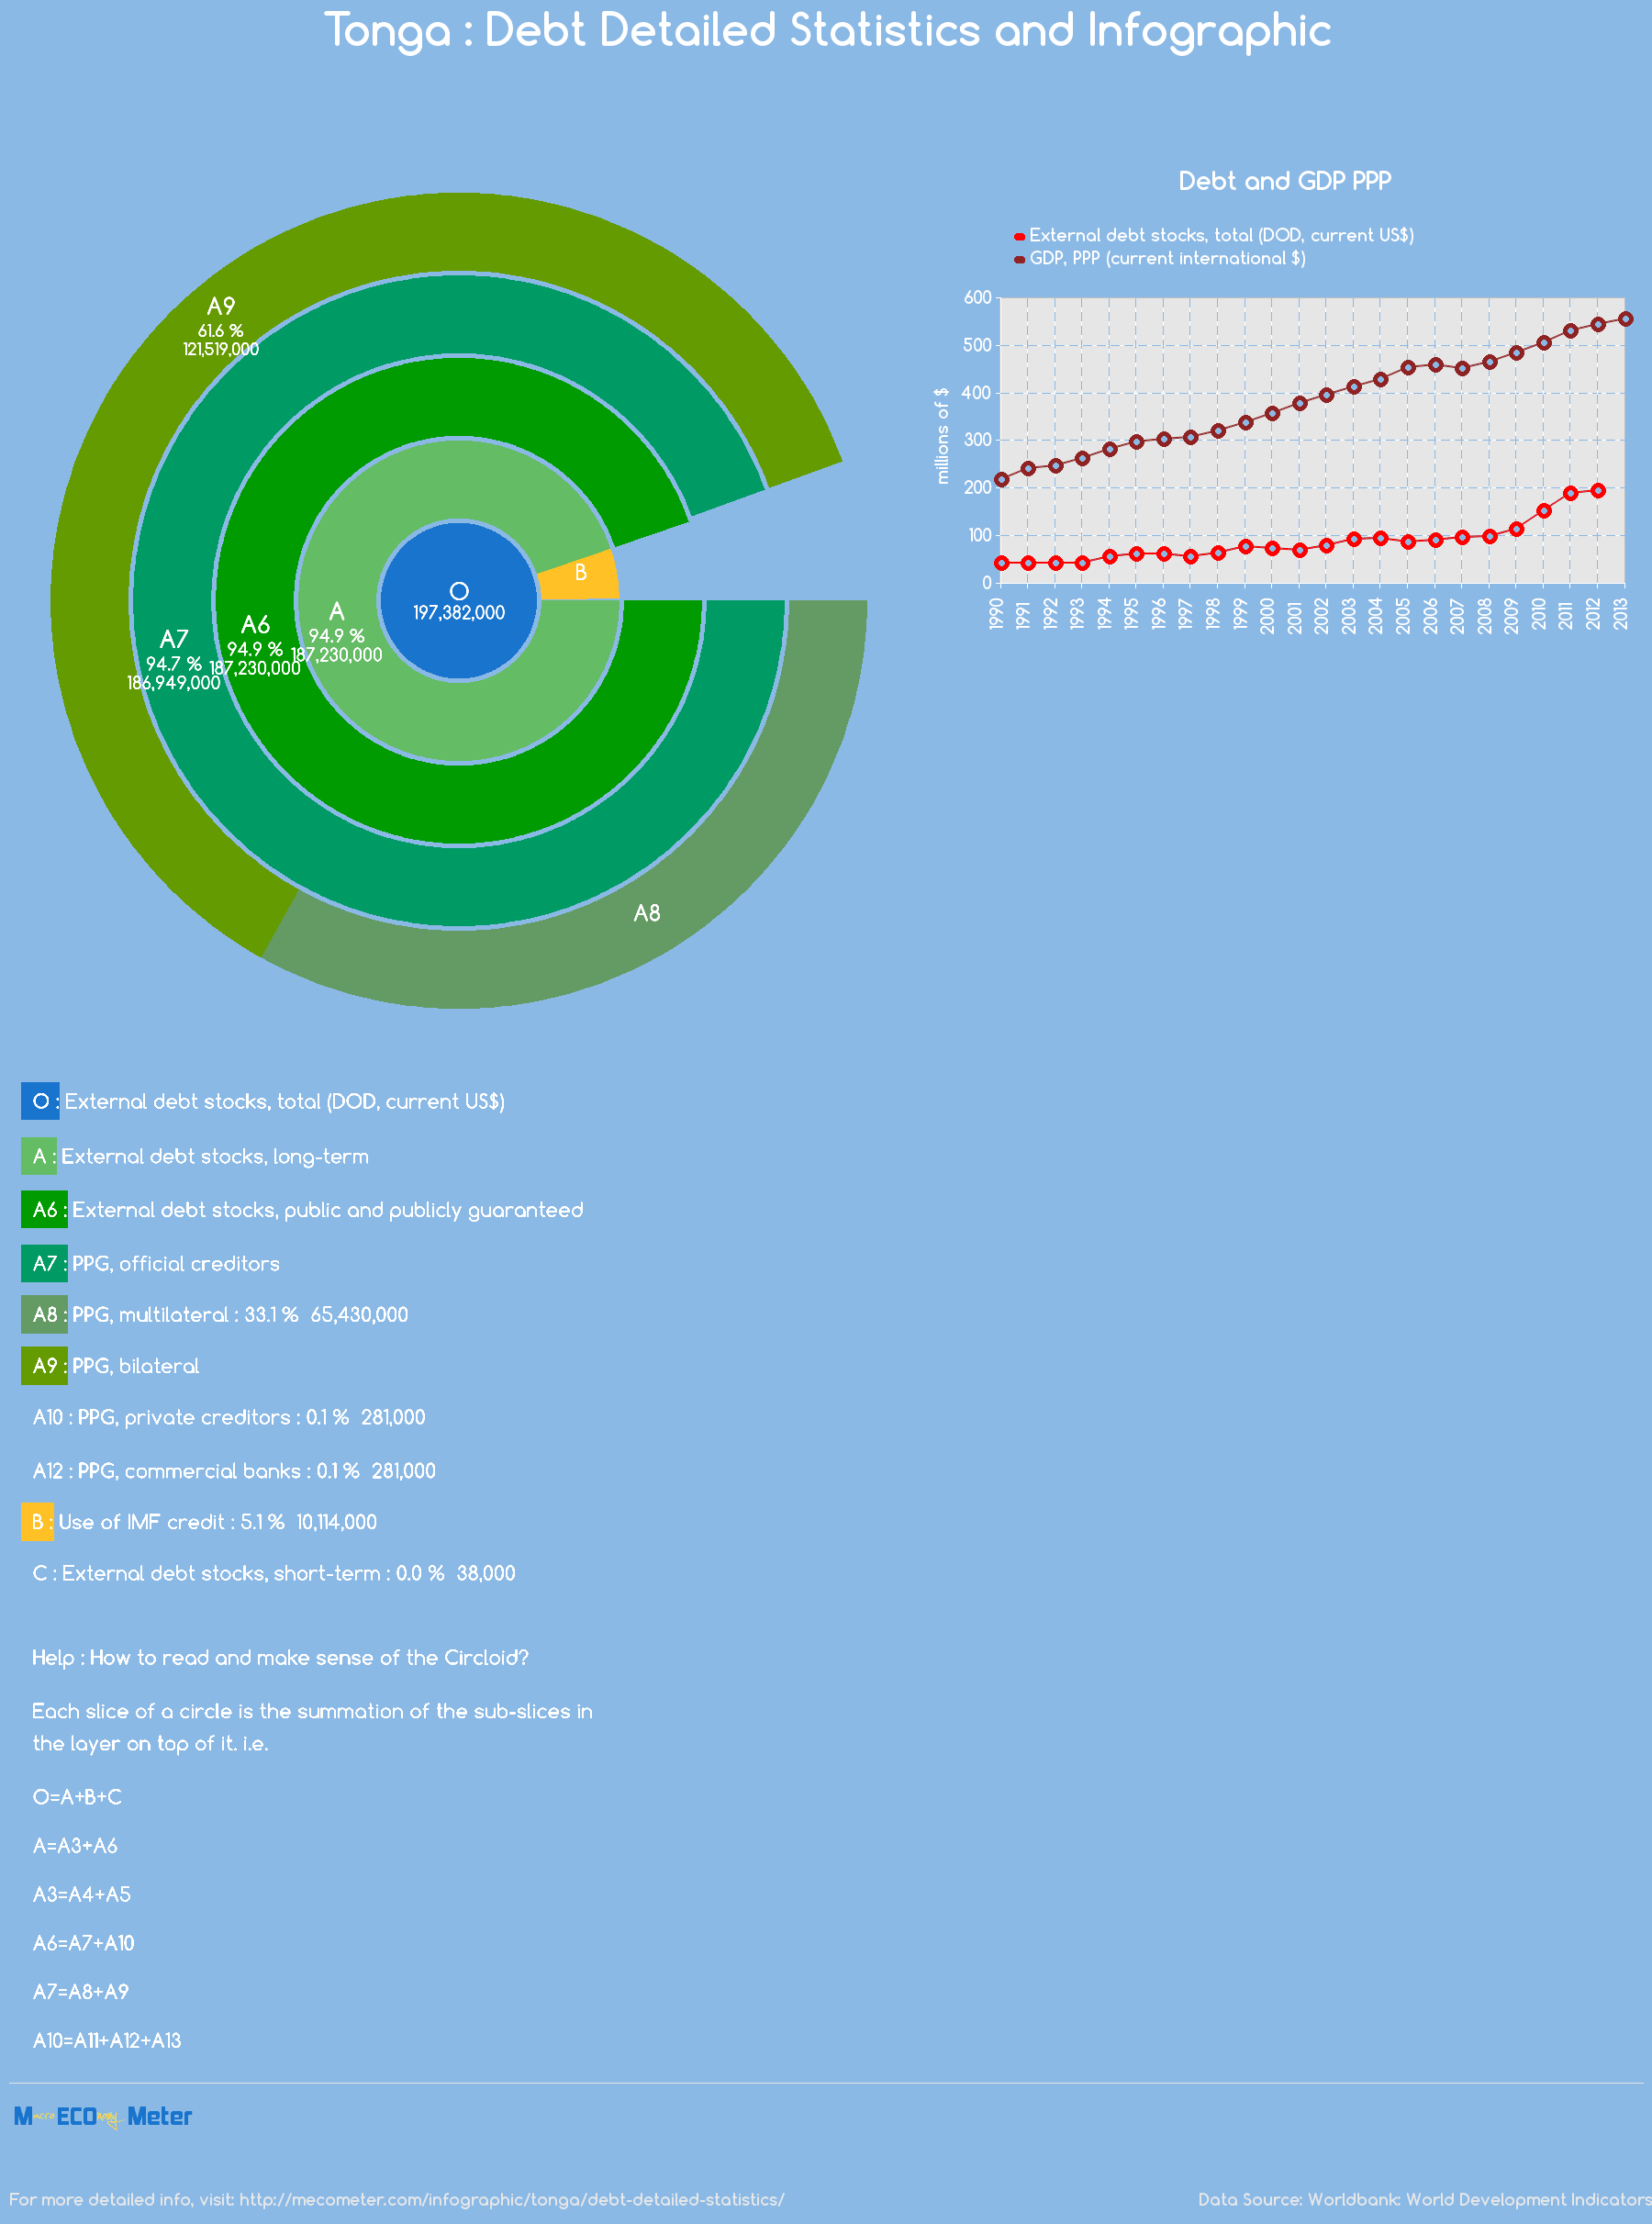 Tonga : Debt Detailed Statistics and Infographic